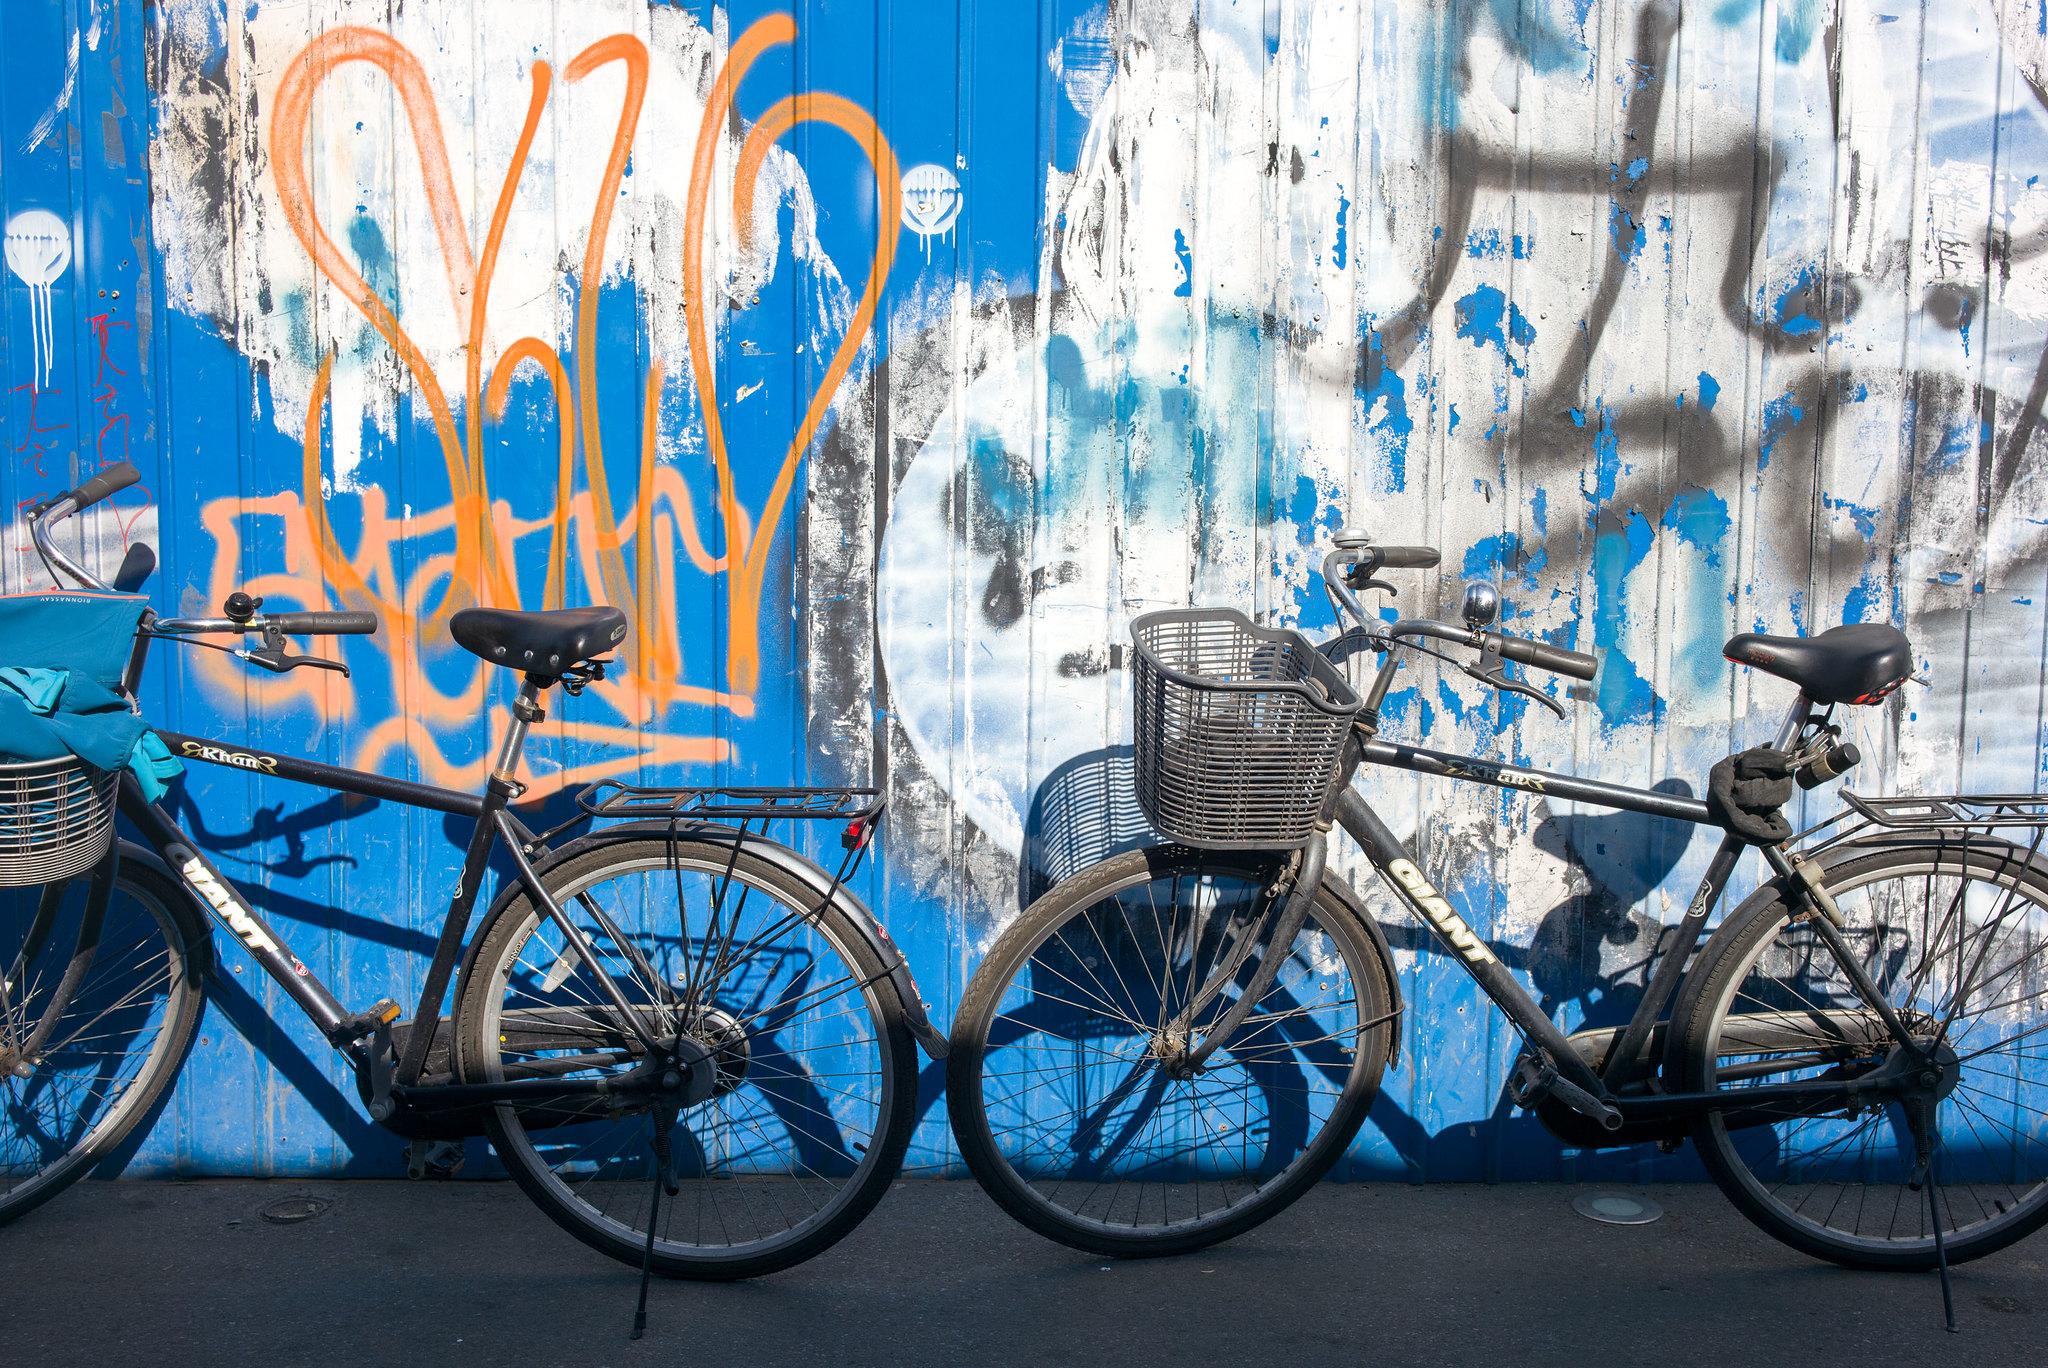 Khan_bikes